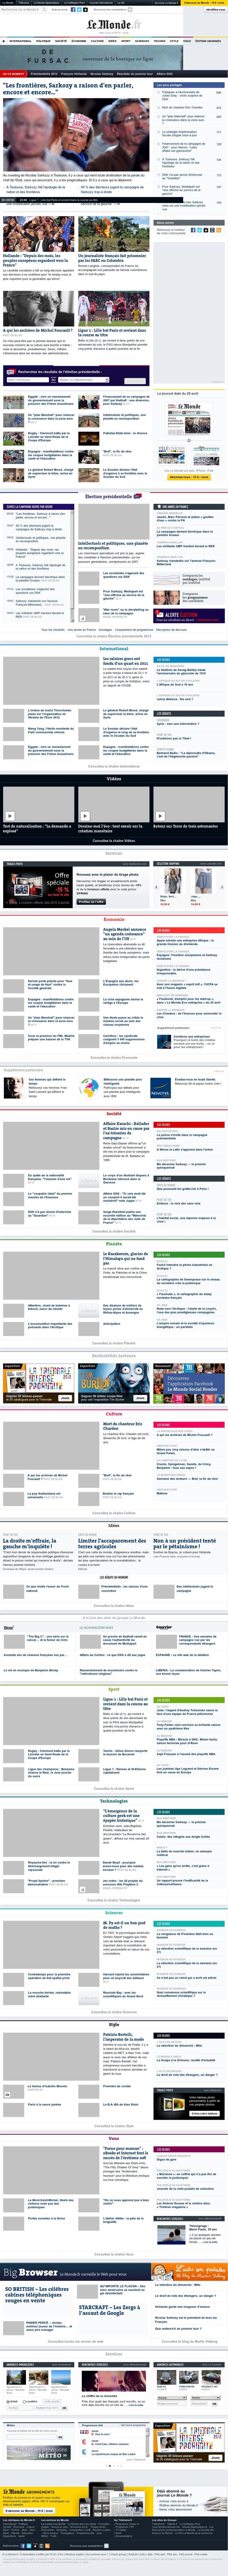 Le Monde at Sunday April 29, 2012, 10:14 p.m. UTC